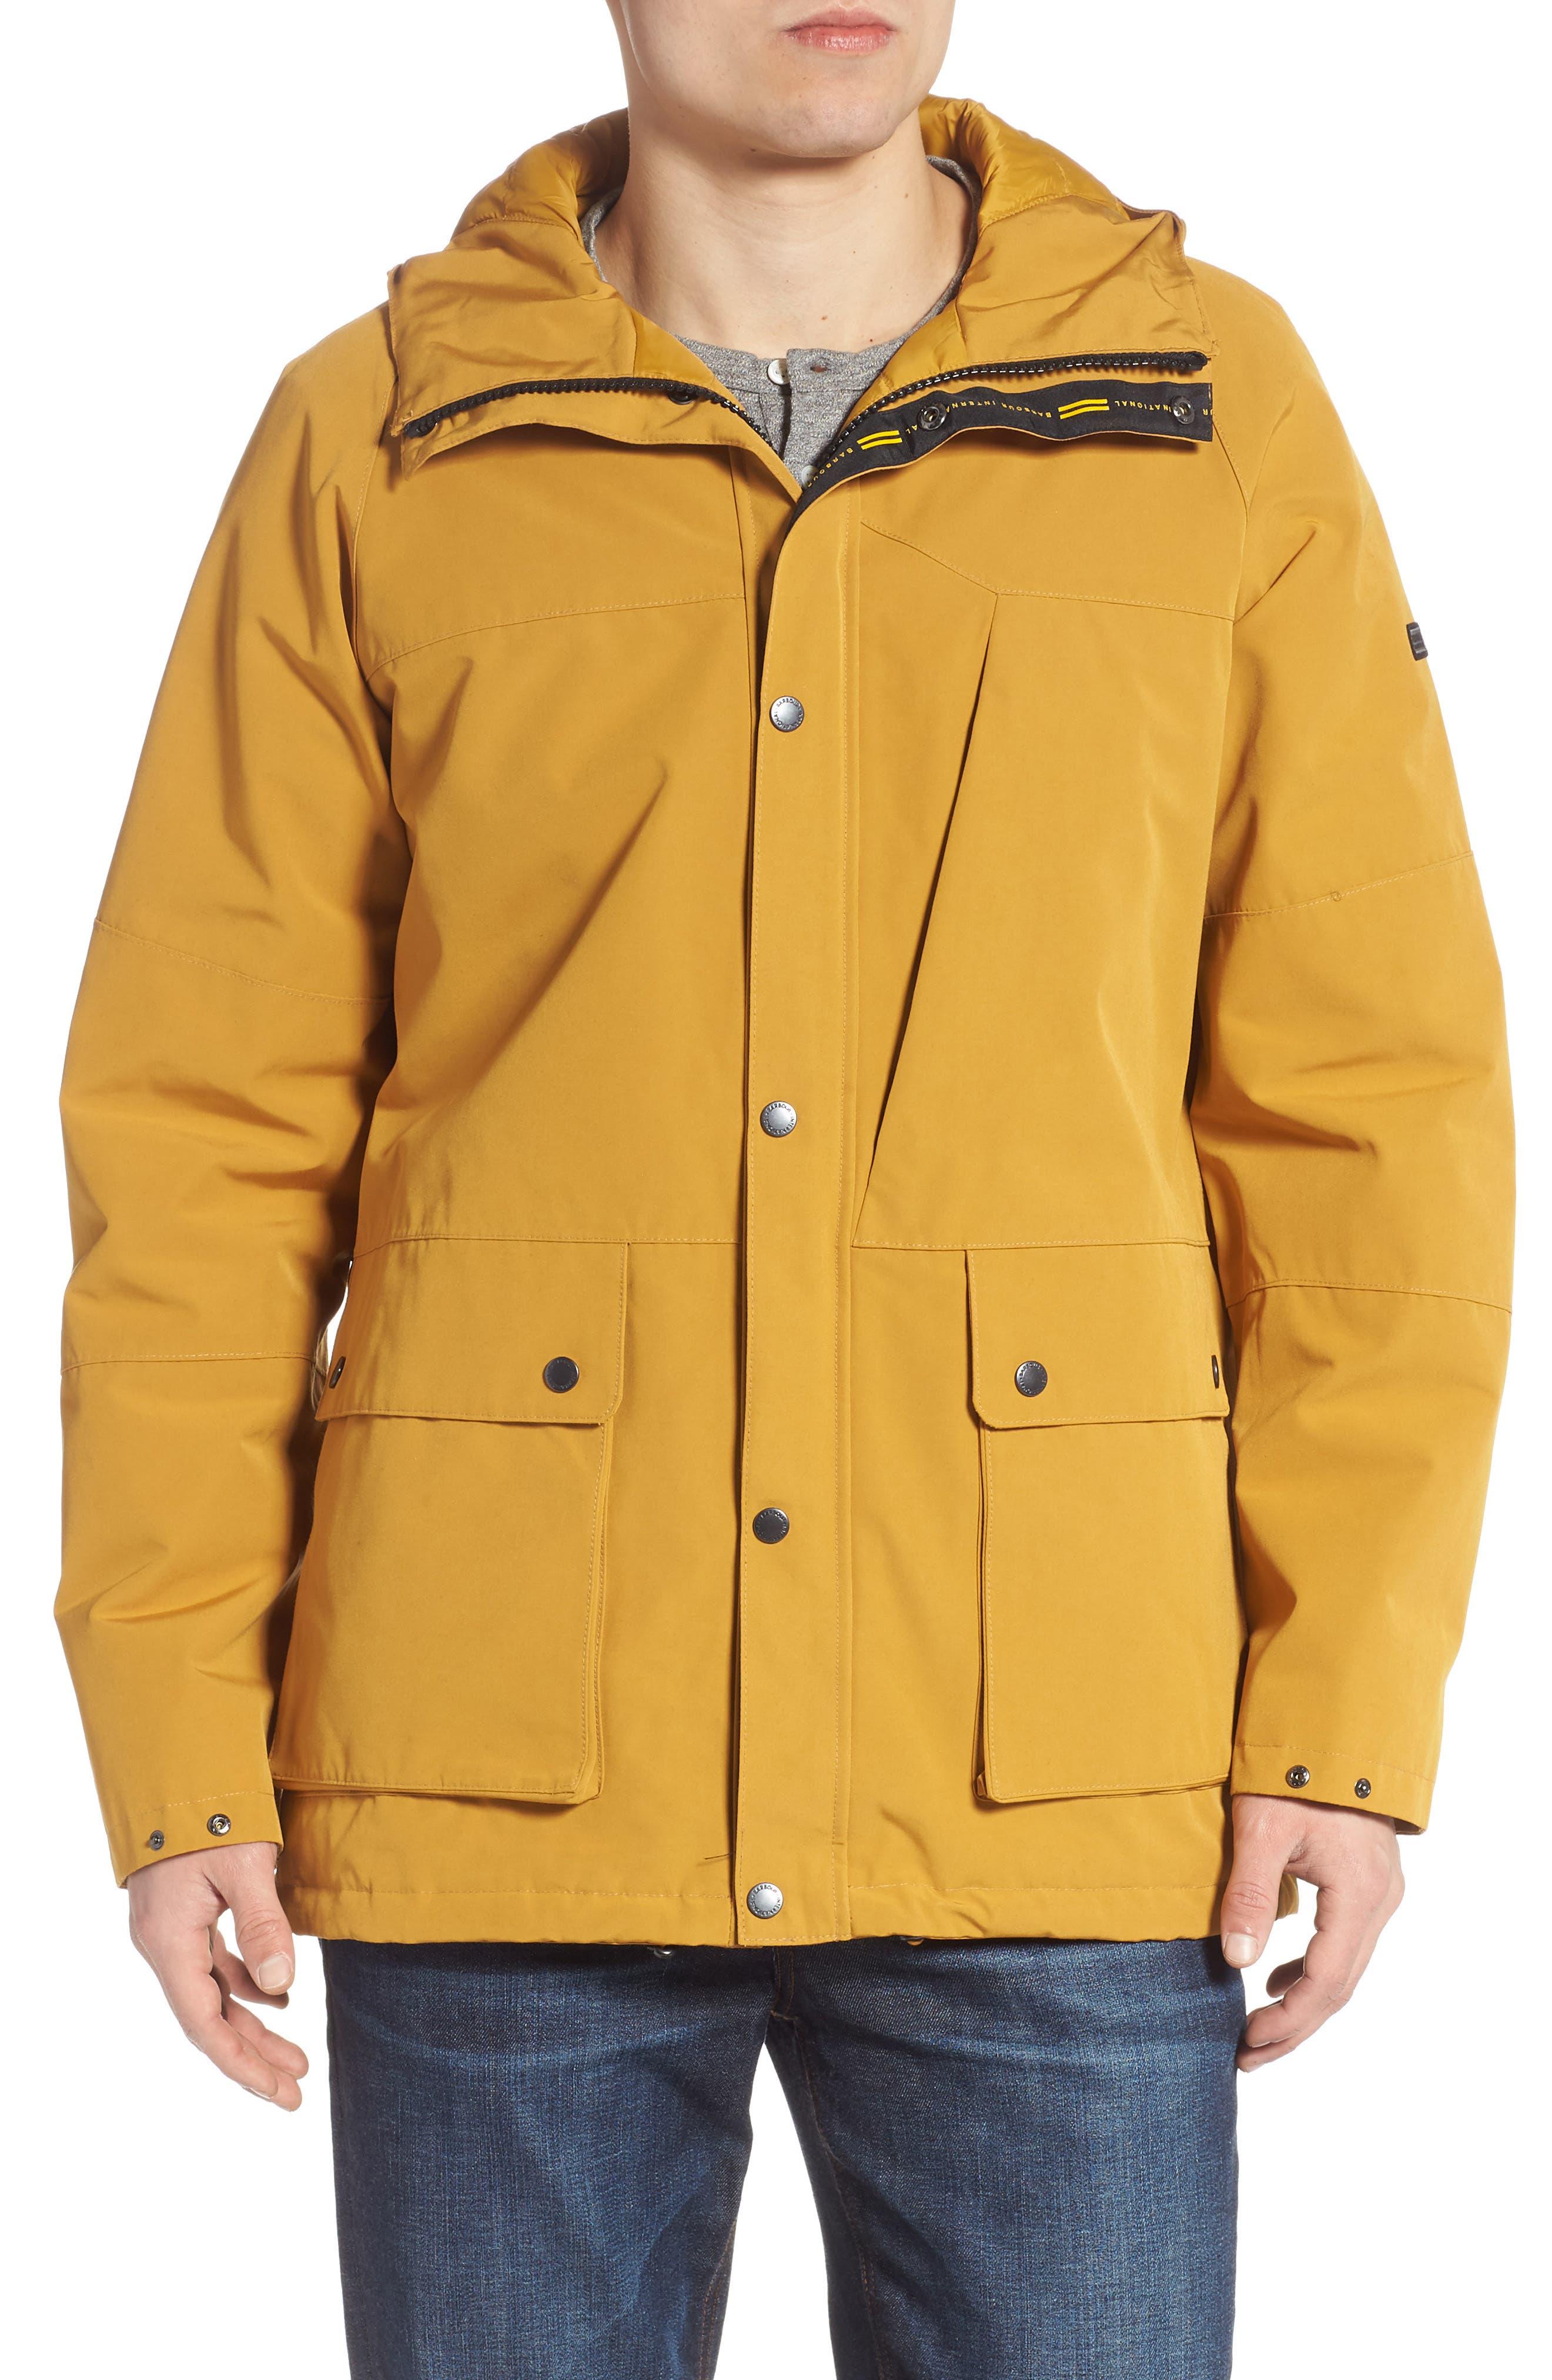 Barbour Bi-Ridge Waterproof Hooded Jacket, Yellow